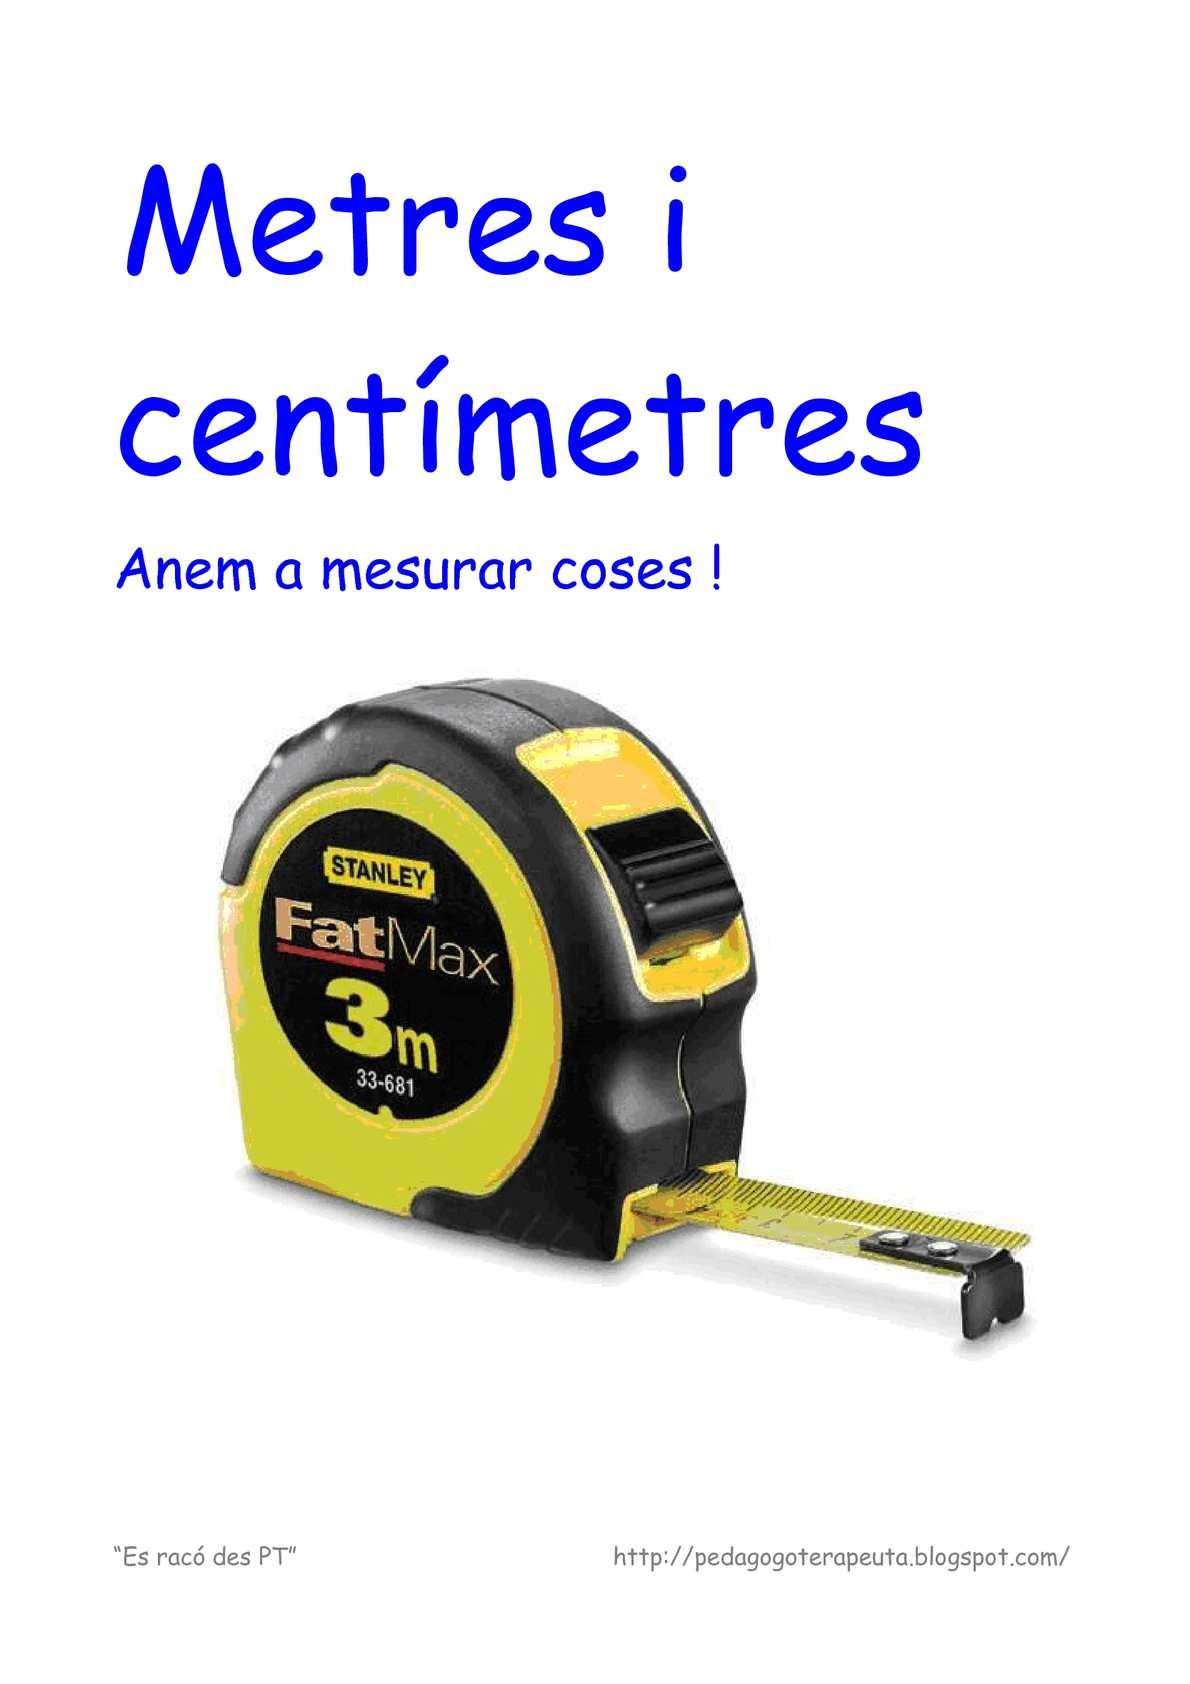 metres i centímetres adaptat